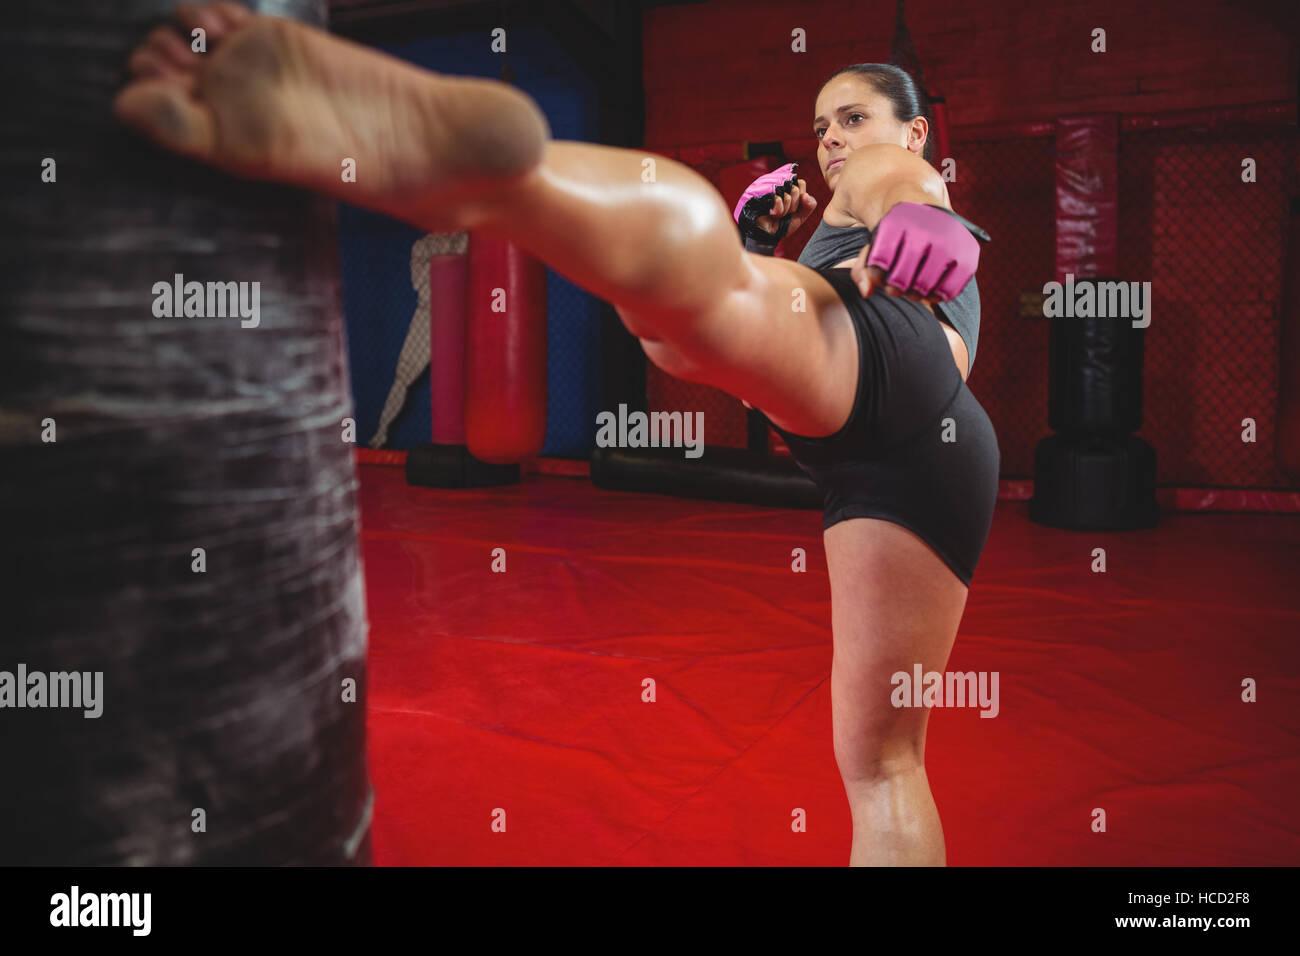 Female boxer punching a boxing bag - Stock Image